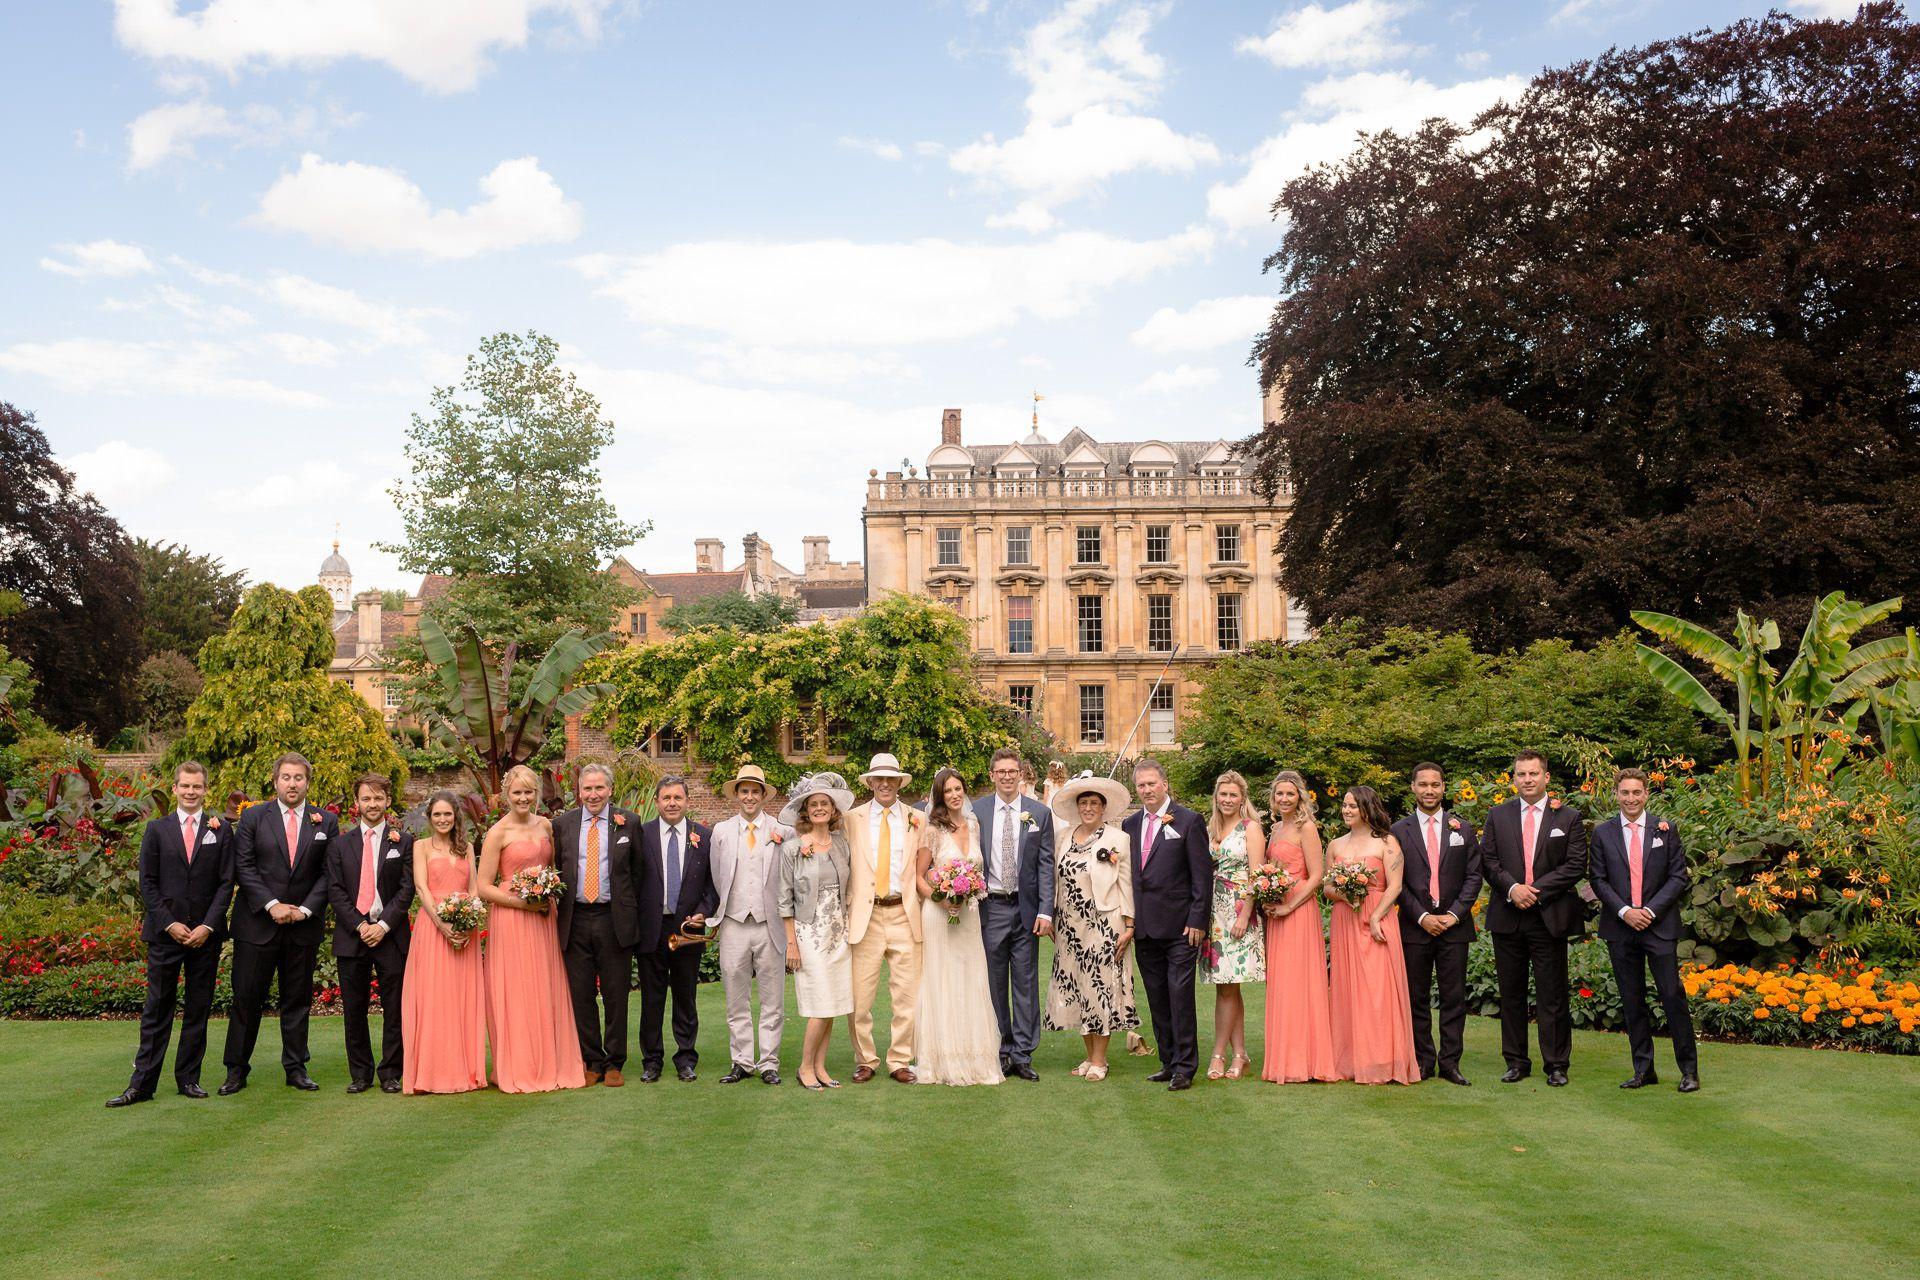 wedding guests posing